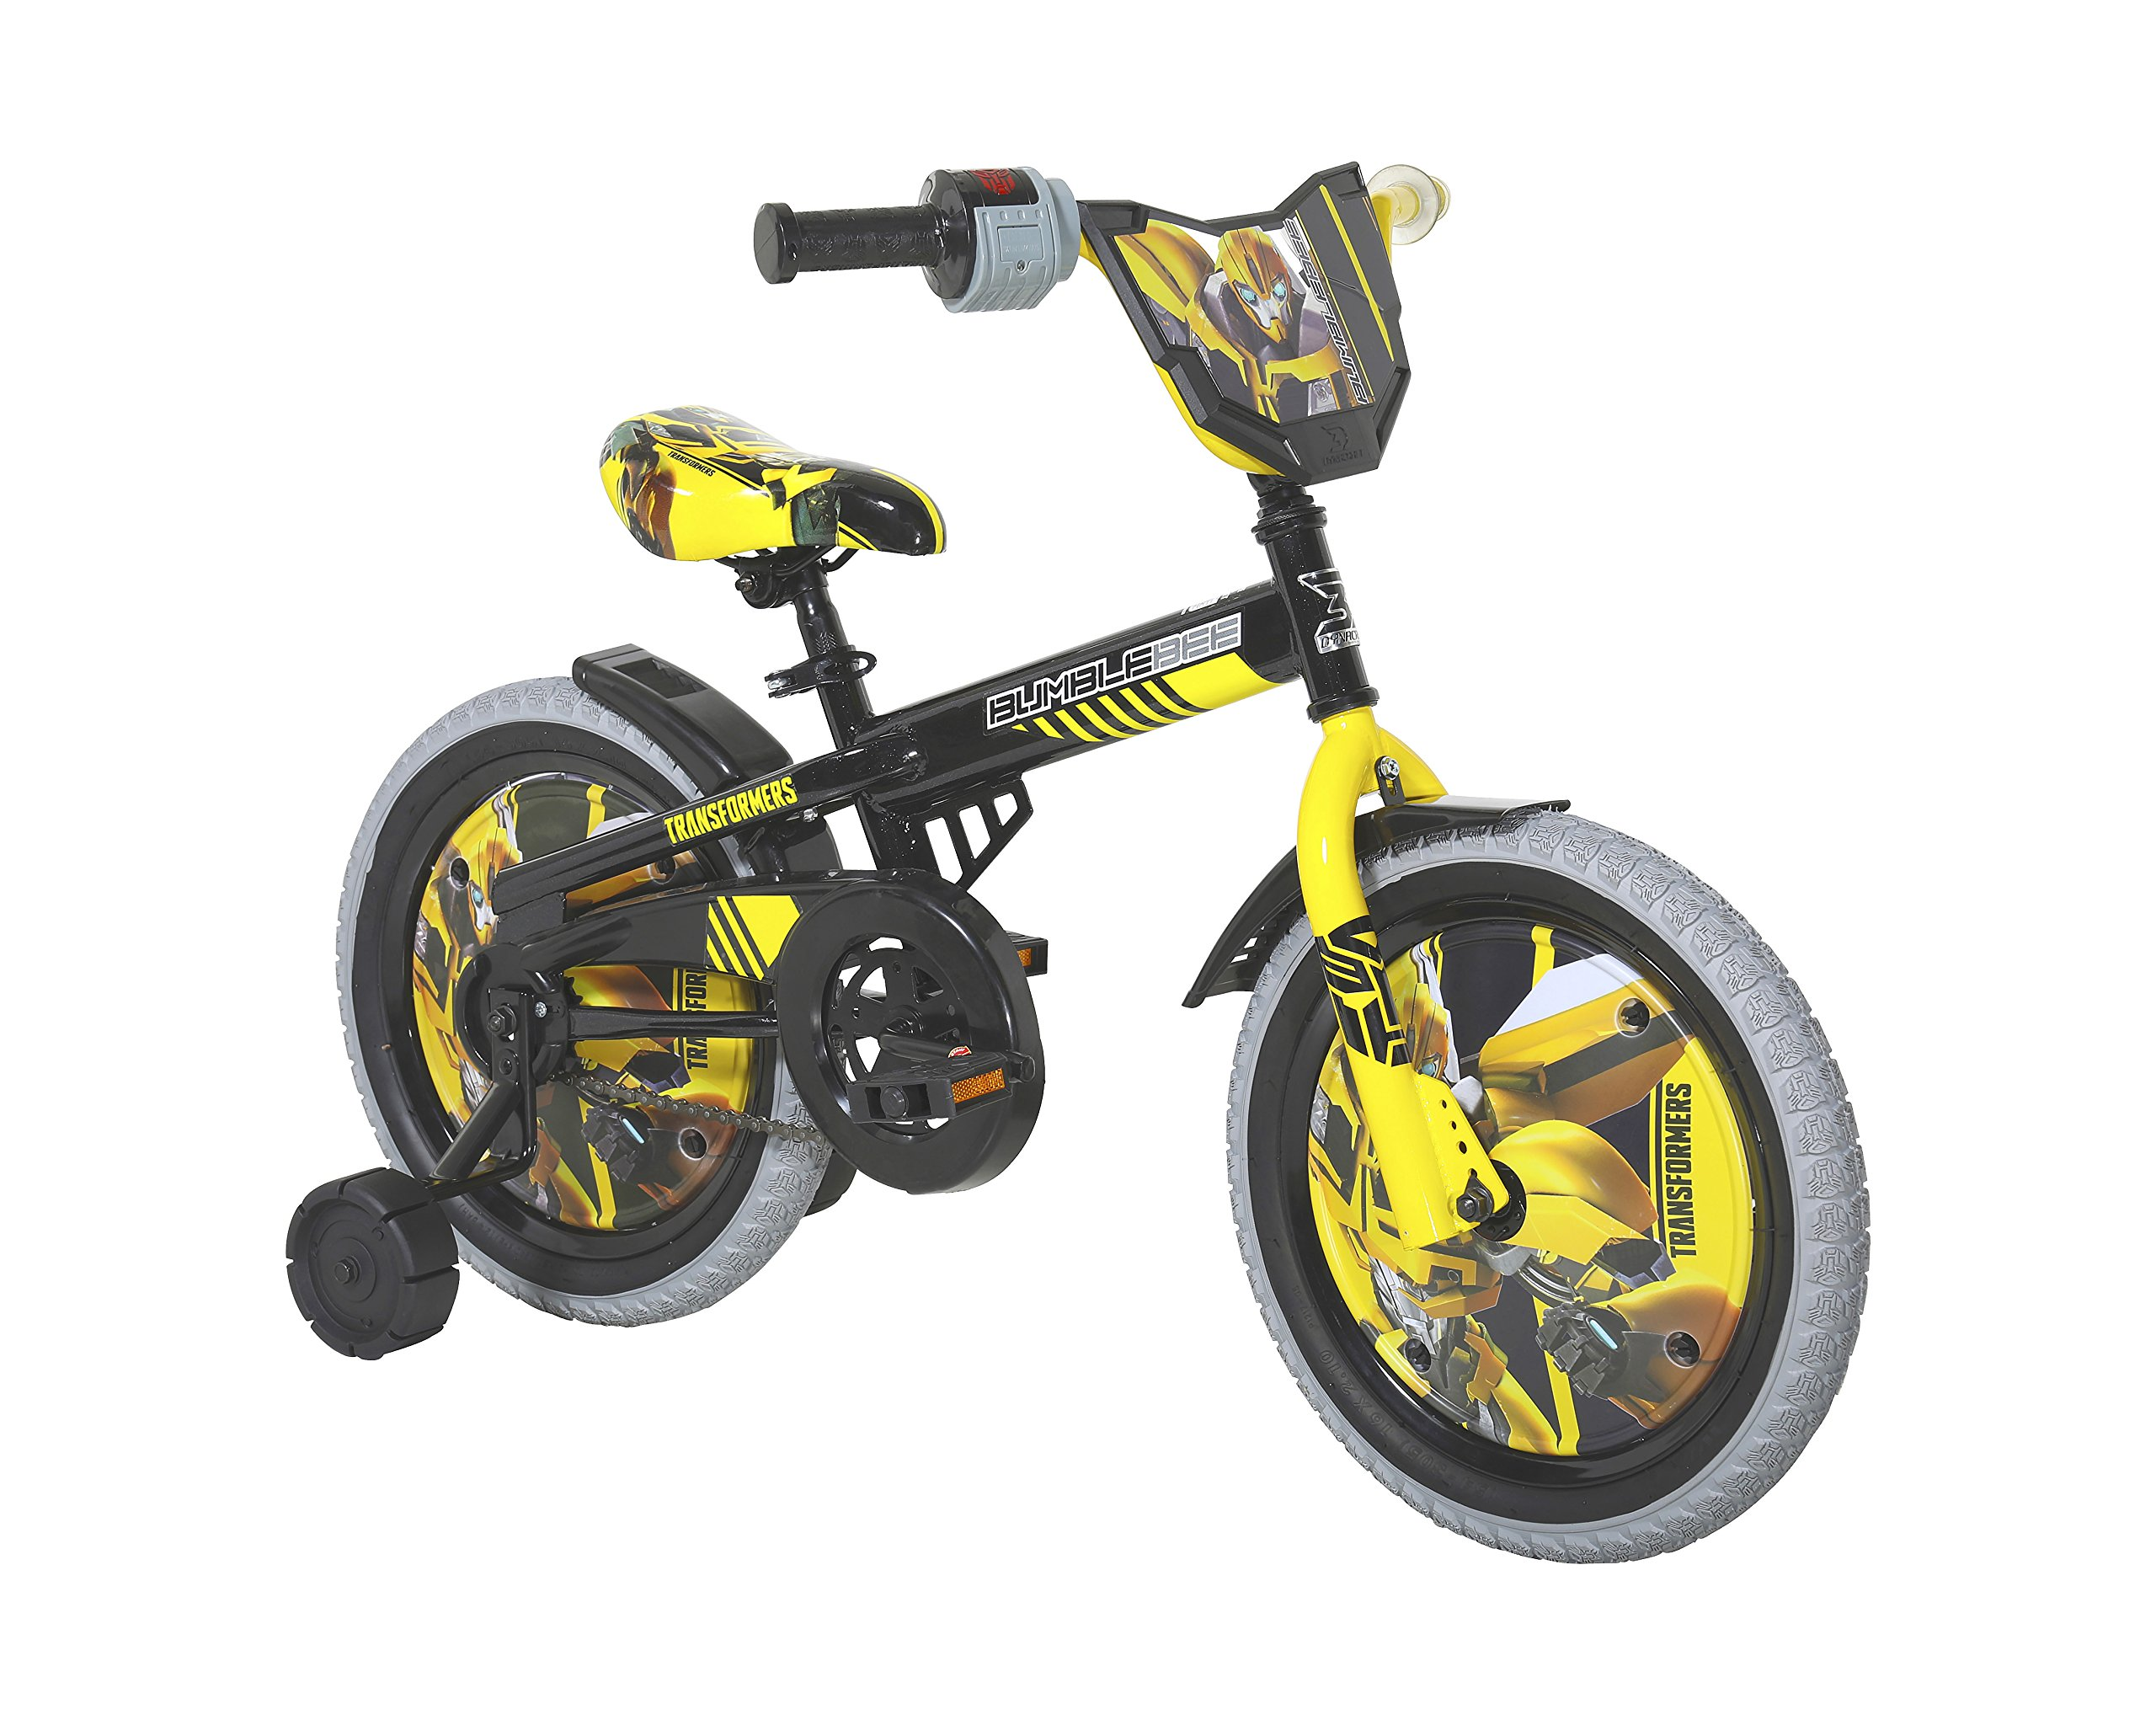 Dynacraft Transformers Bumble Bee Boys BMX Street Bike 16'', Black/Yellow/Gray